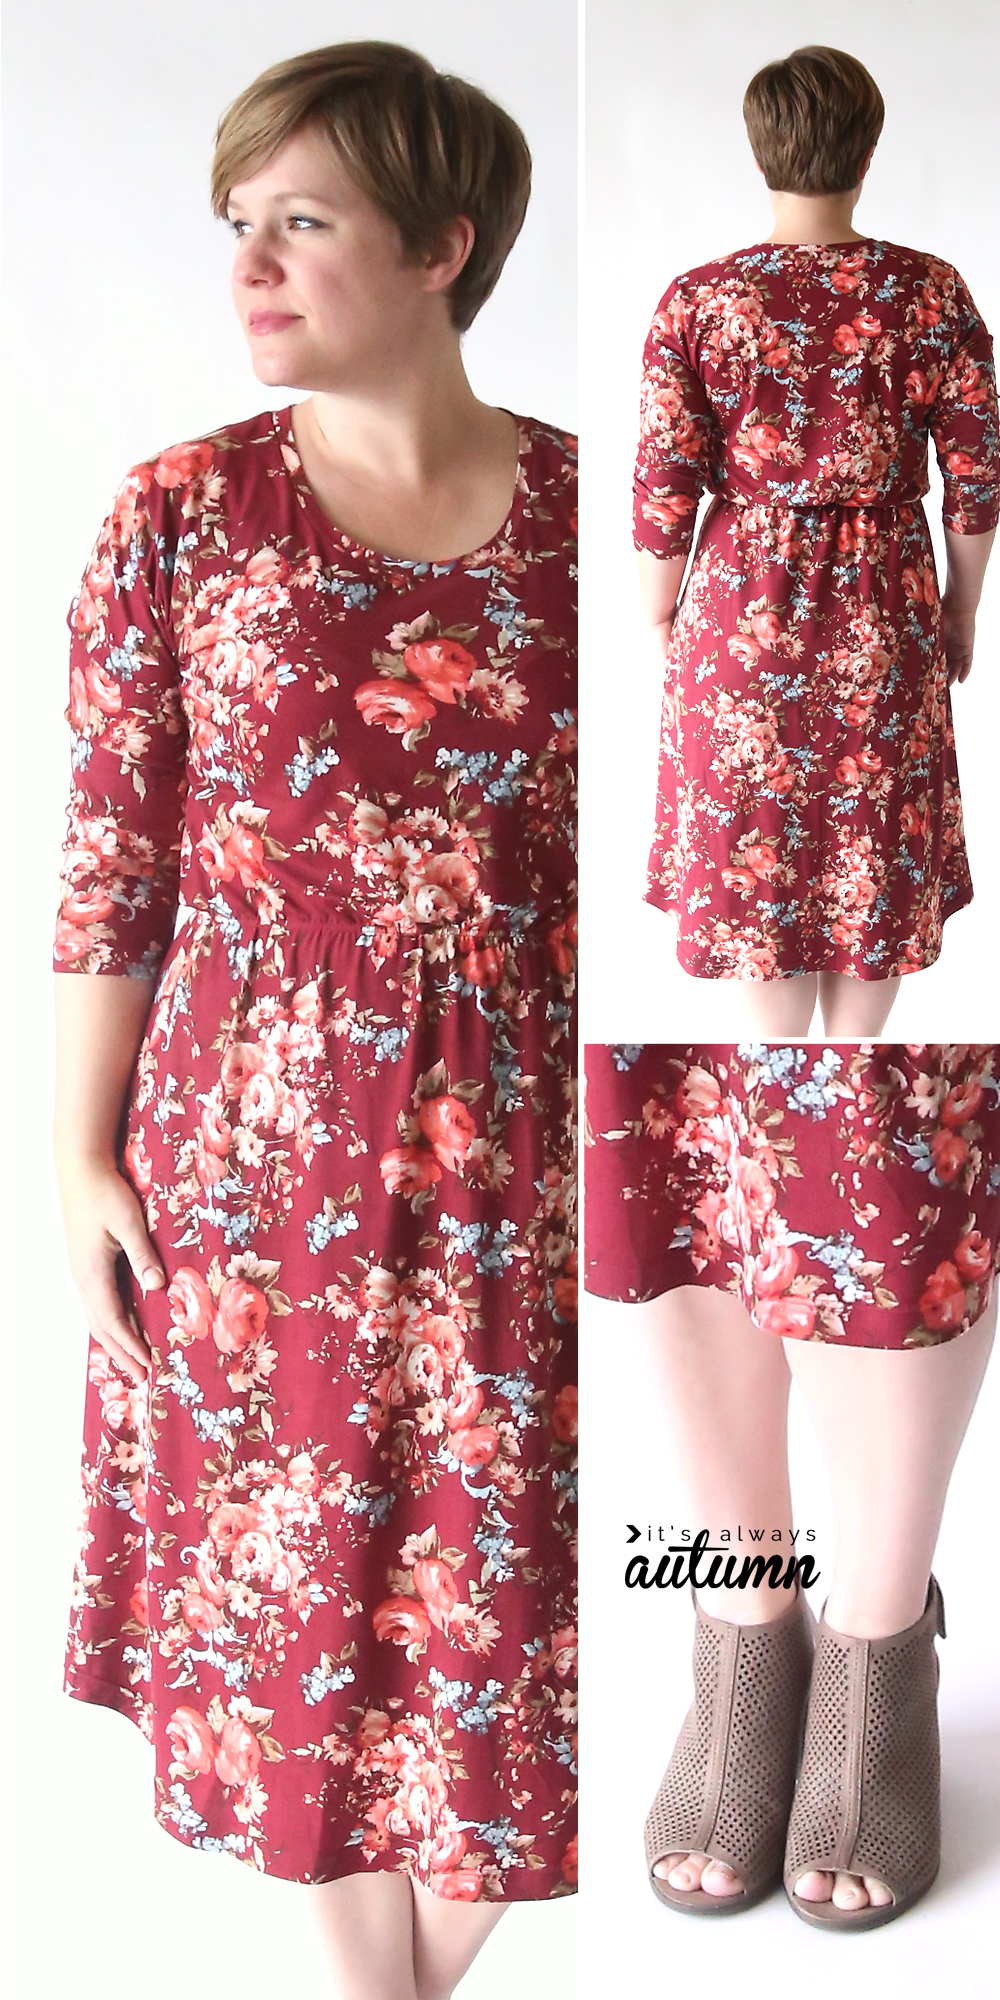 Cute dress patterns for women